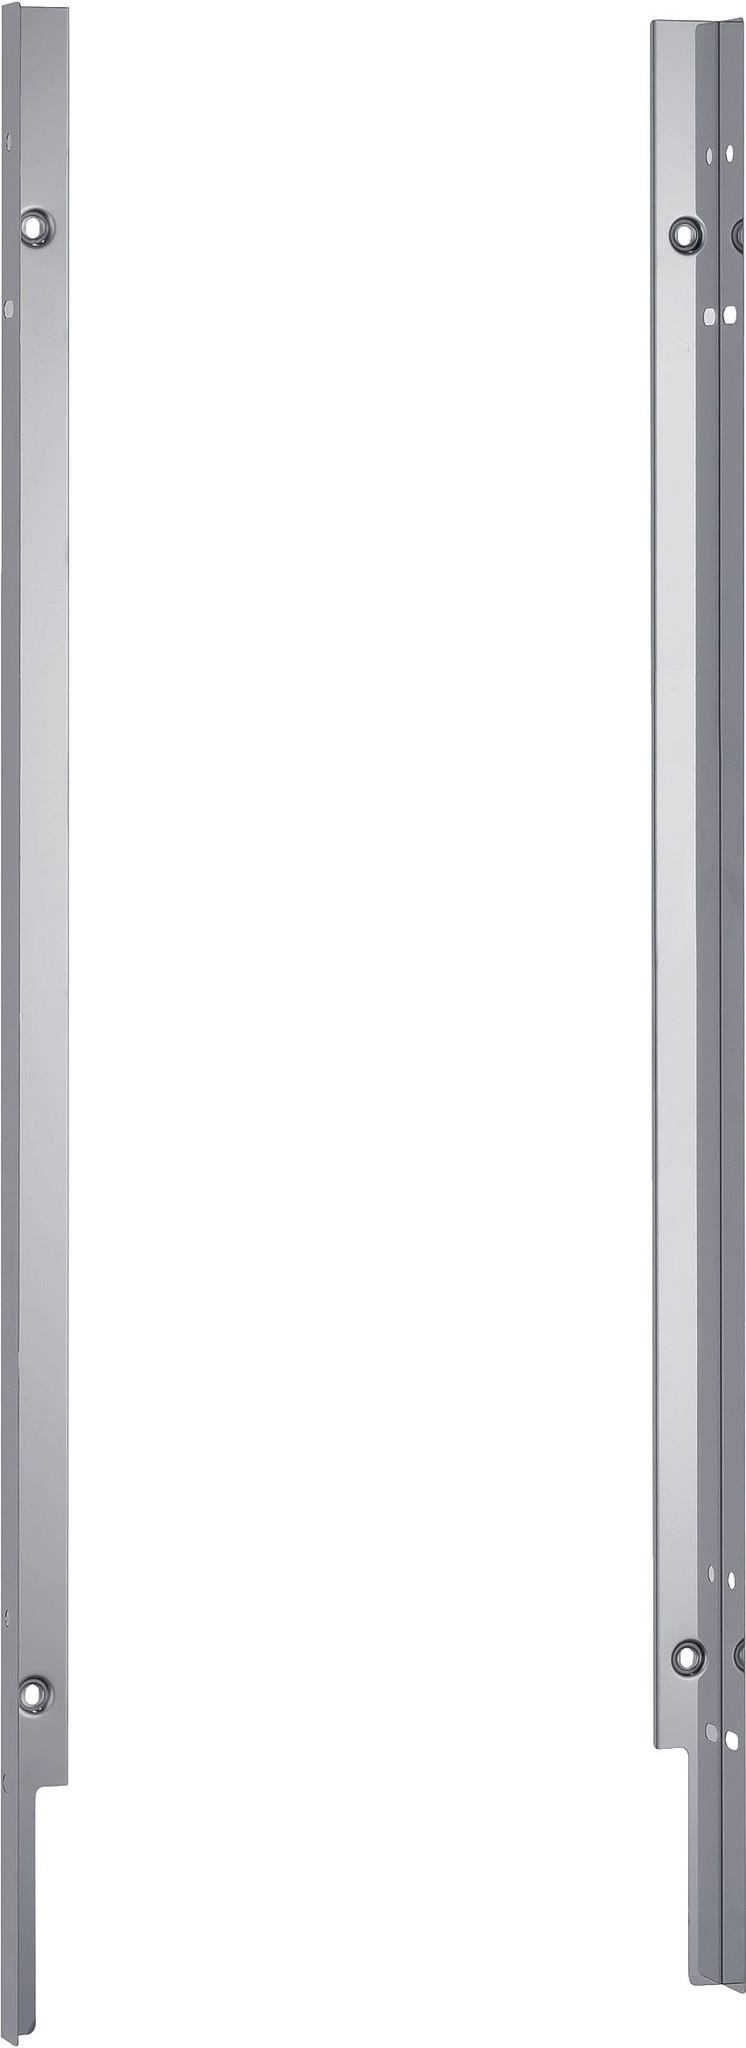 Bosch Voeringband SMZ5015